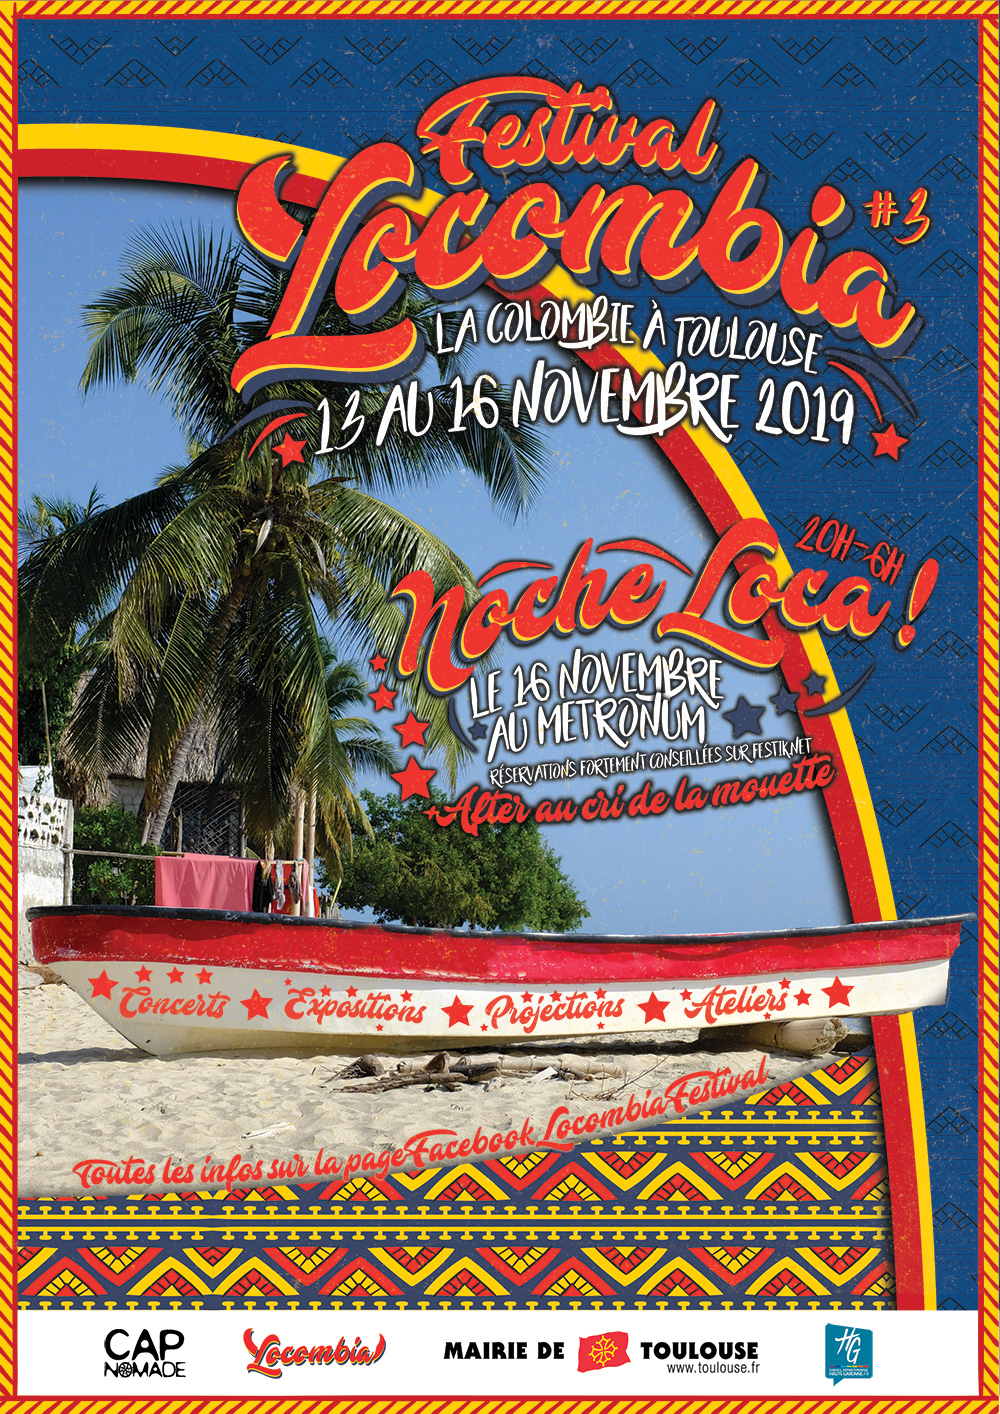 Festival Locombia